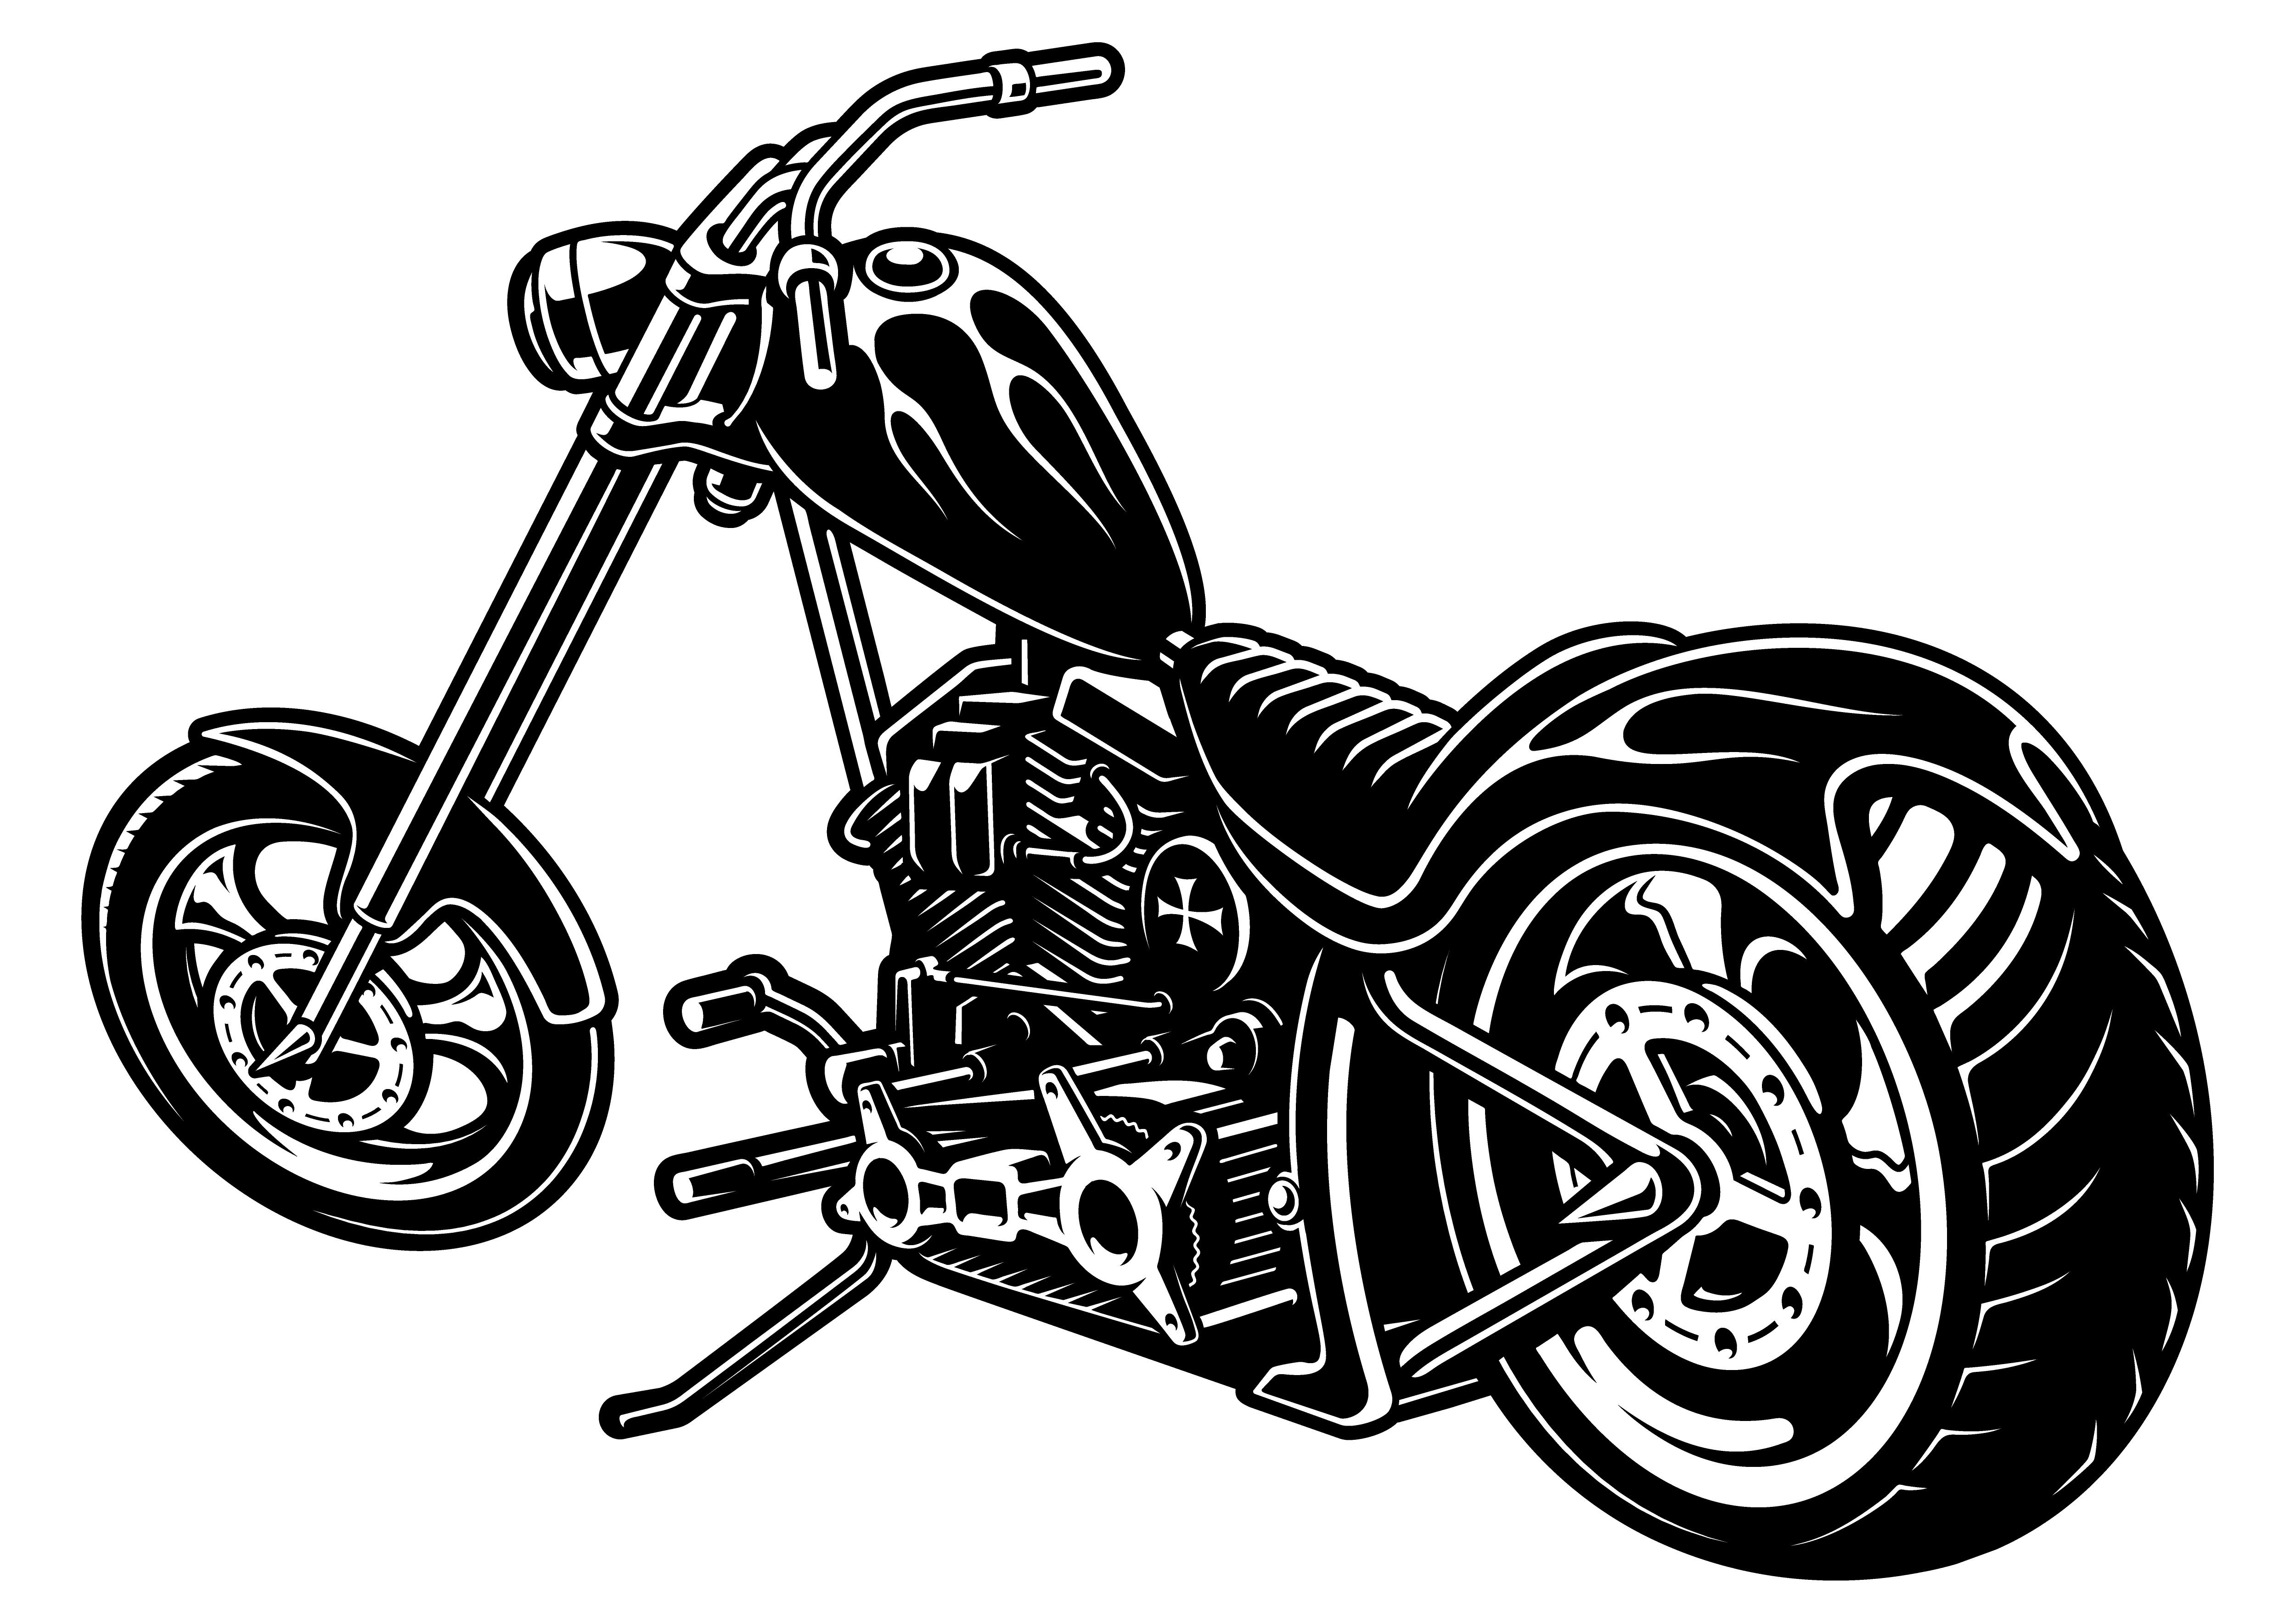 Motorcycle chopper on white bakcground - Download Free ...